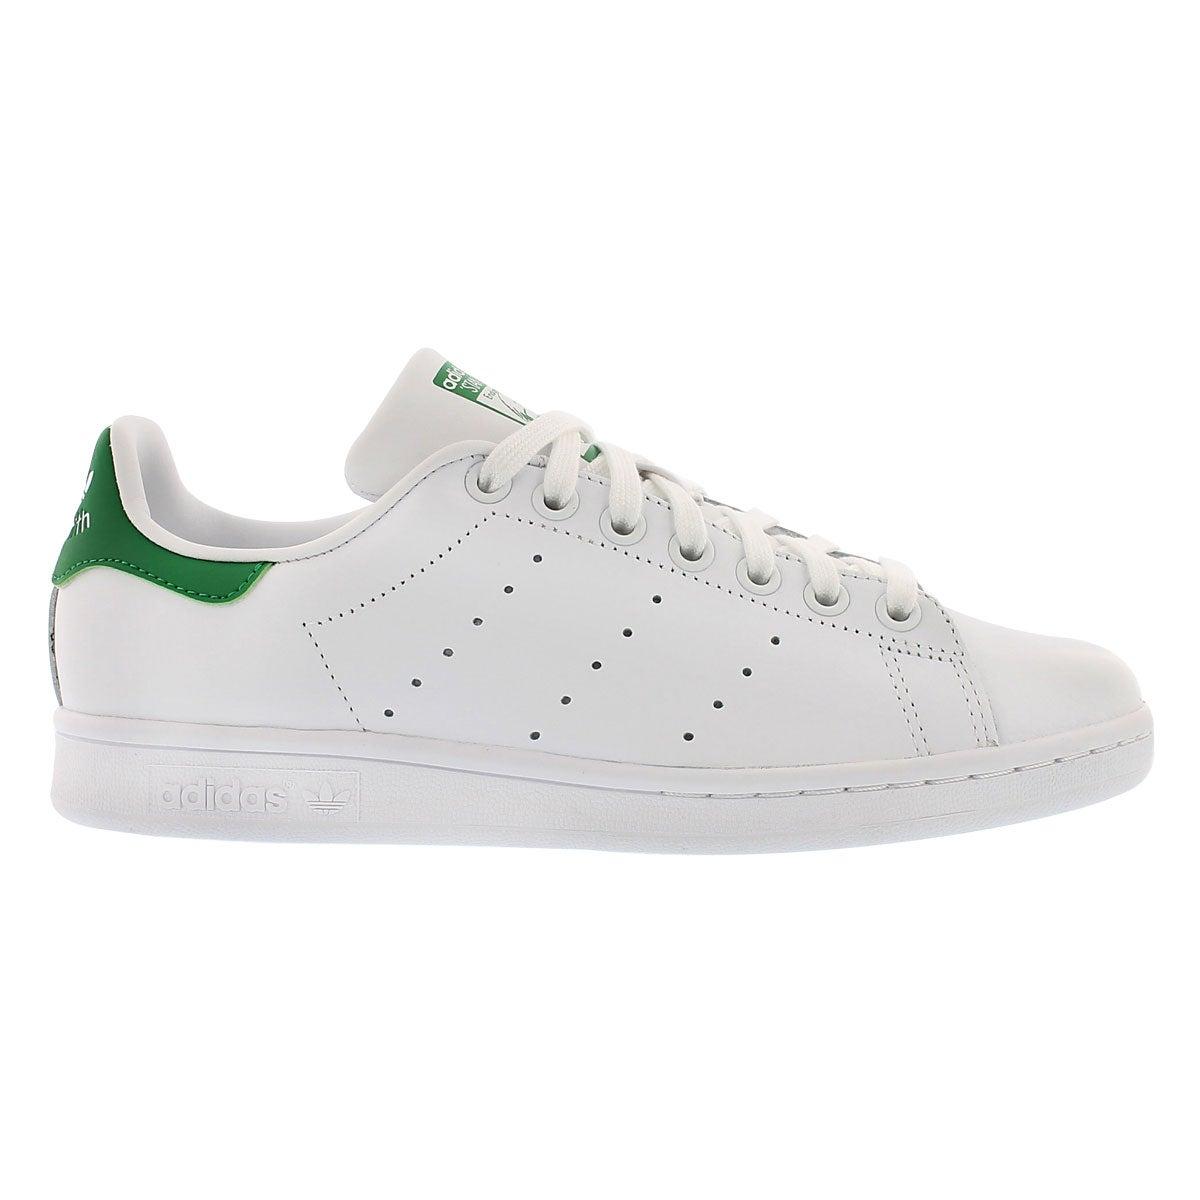 Lds Stan Smith white/green sneaker